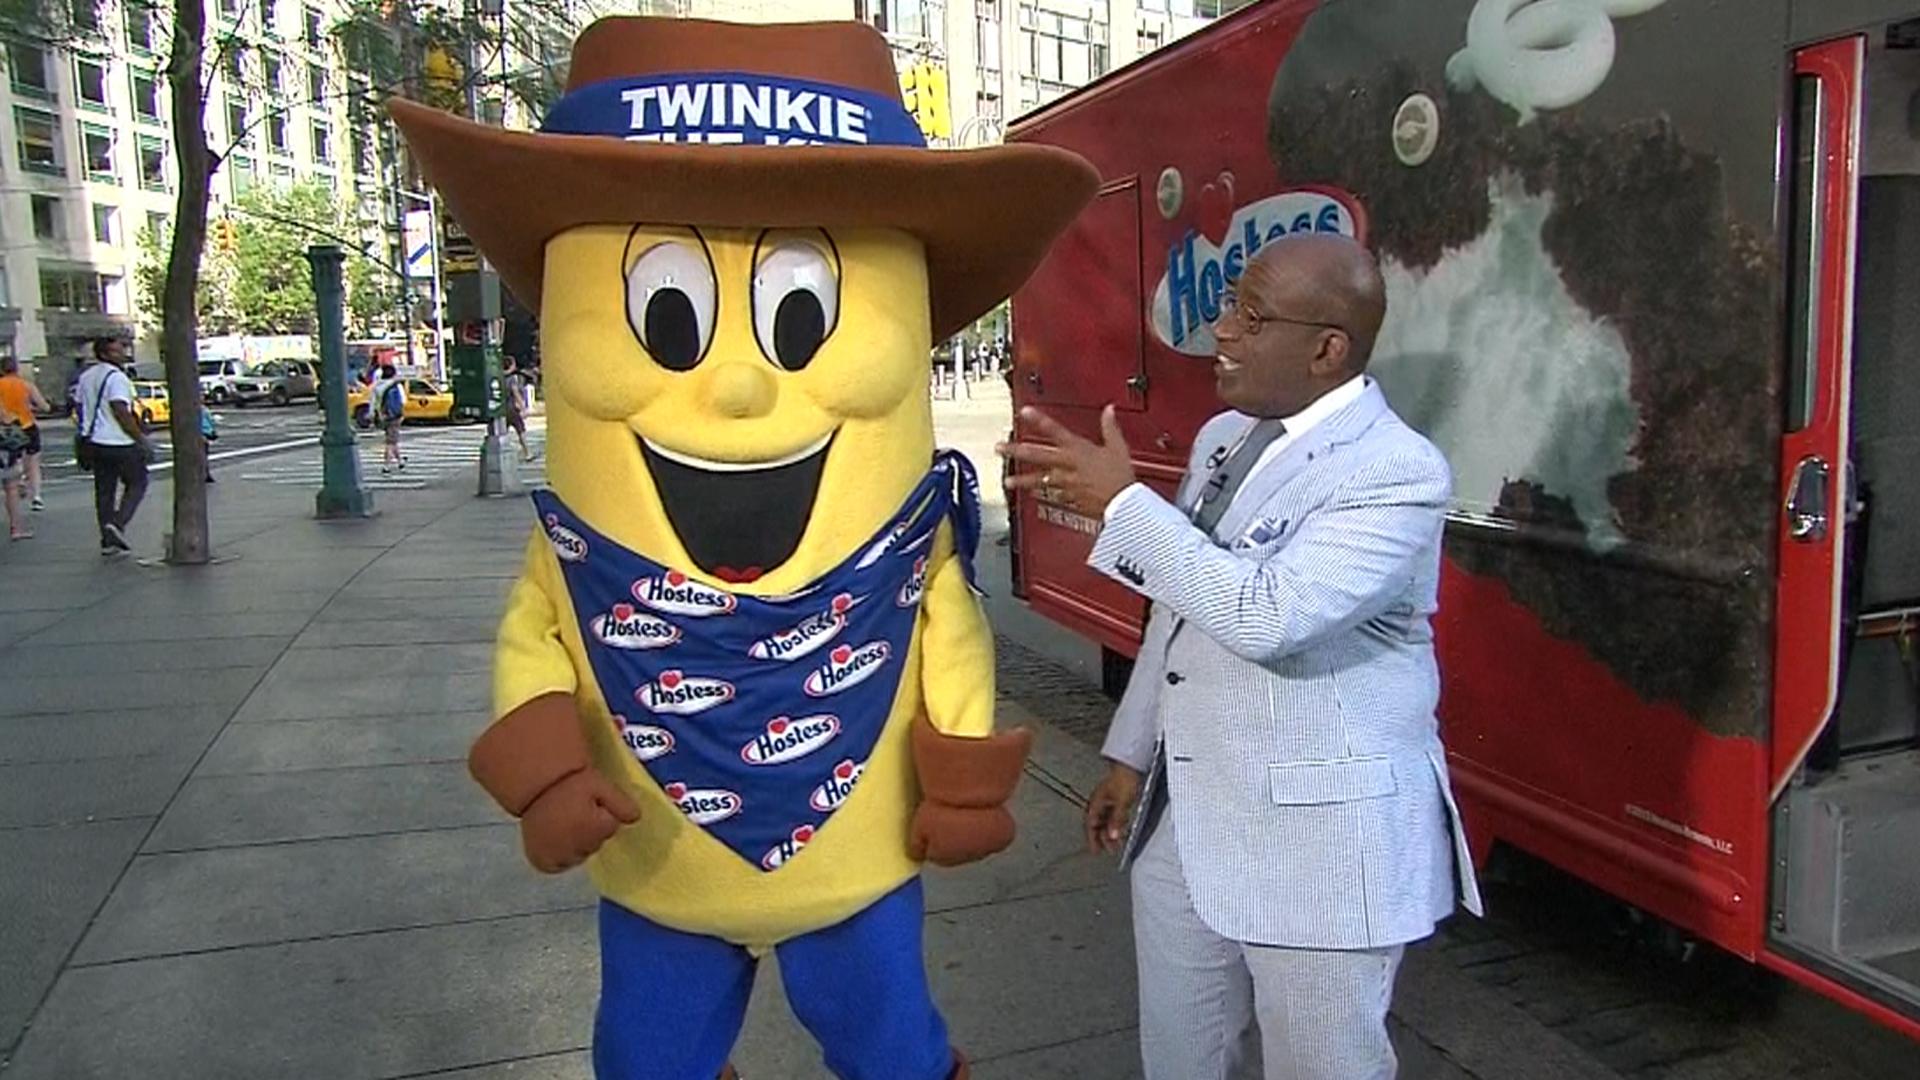 Sweet comeback Al helps Twinkies make their return 1920x1080